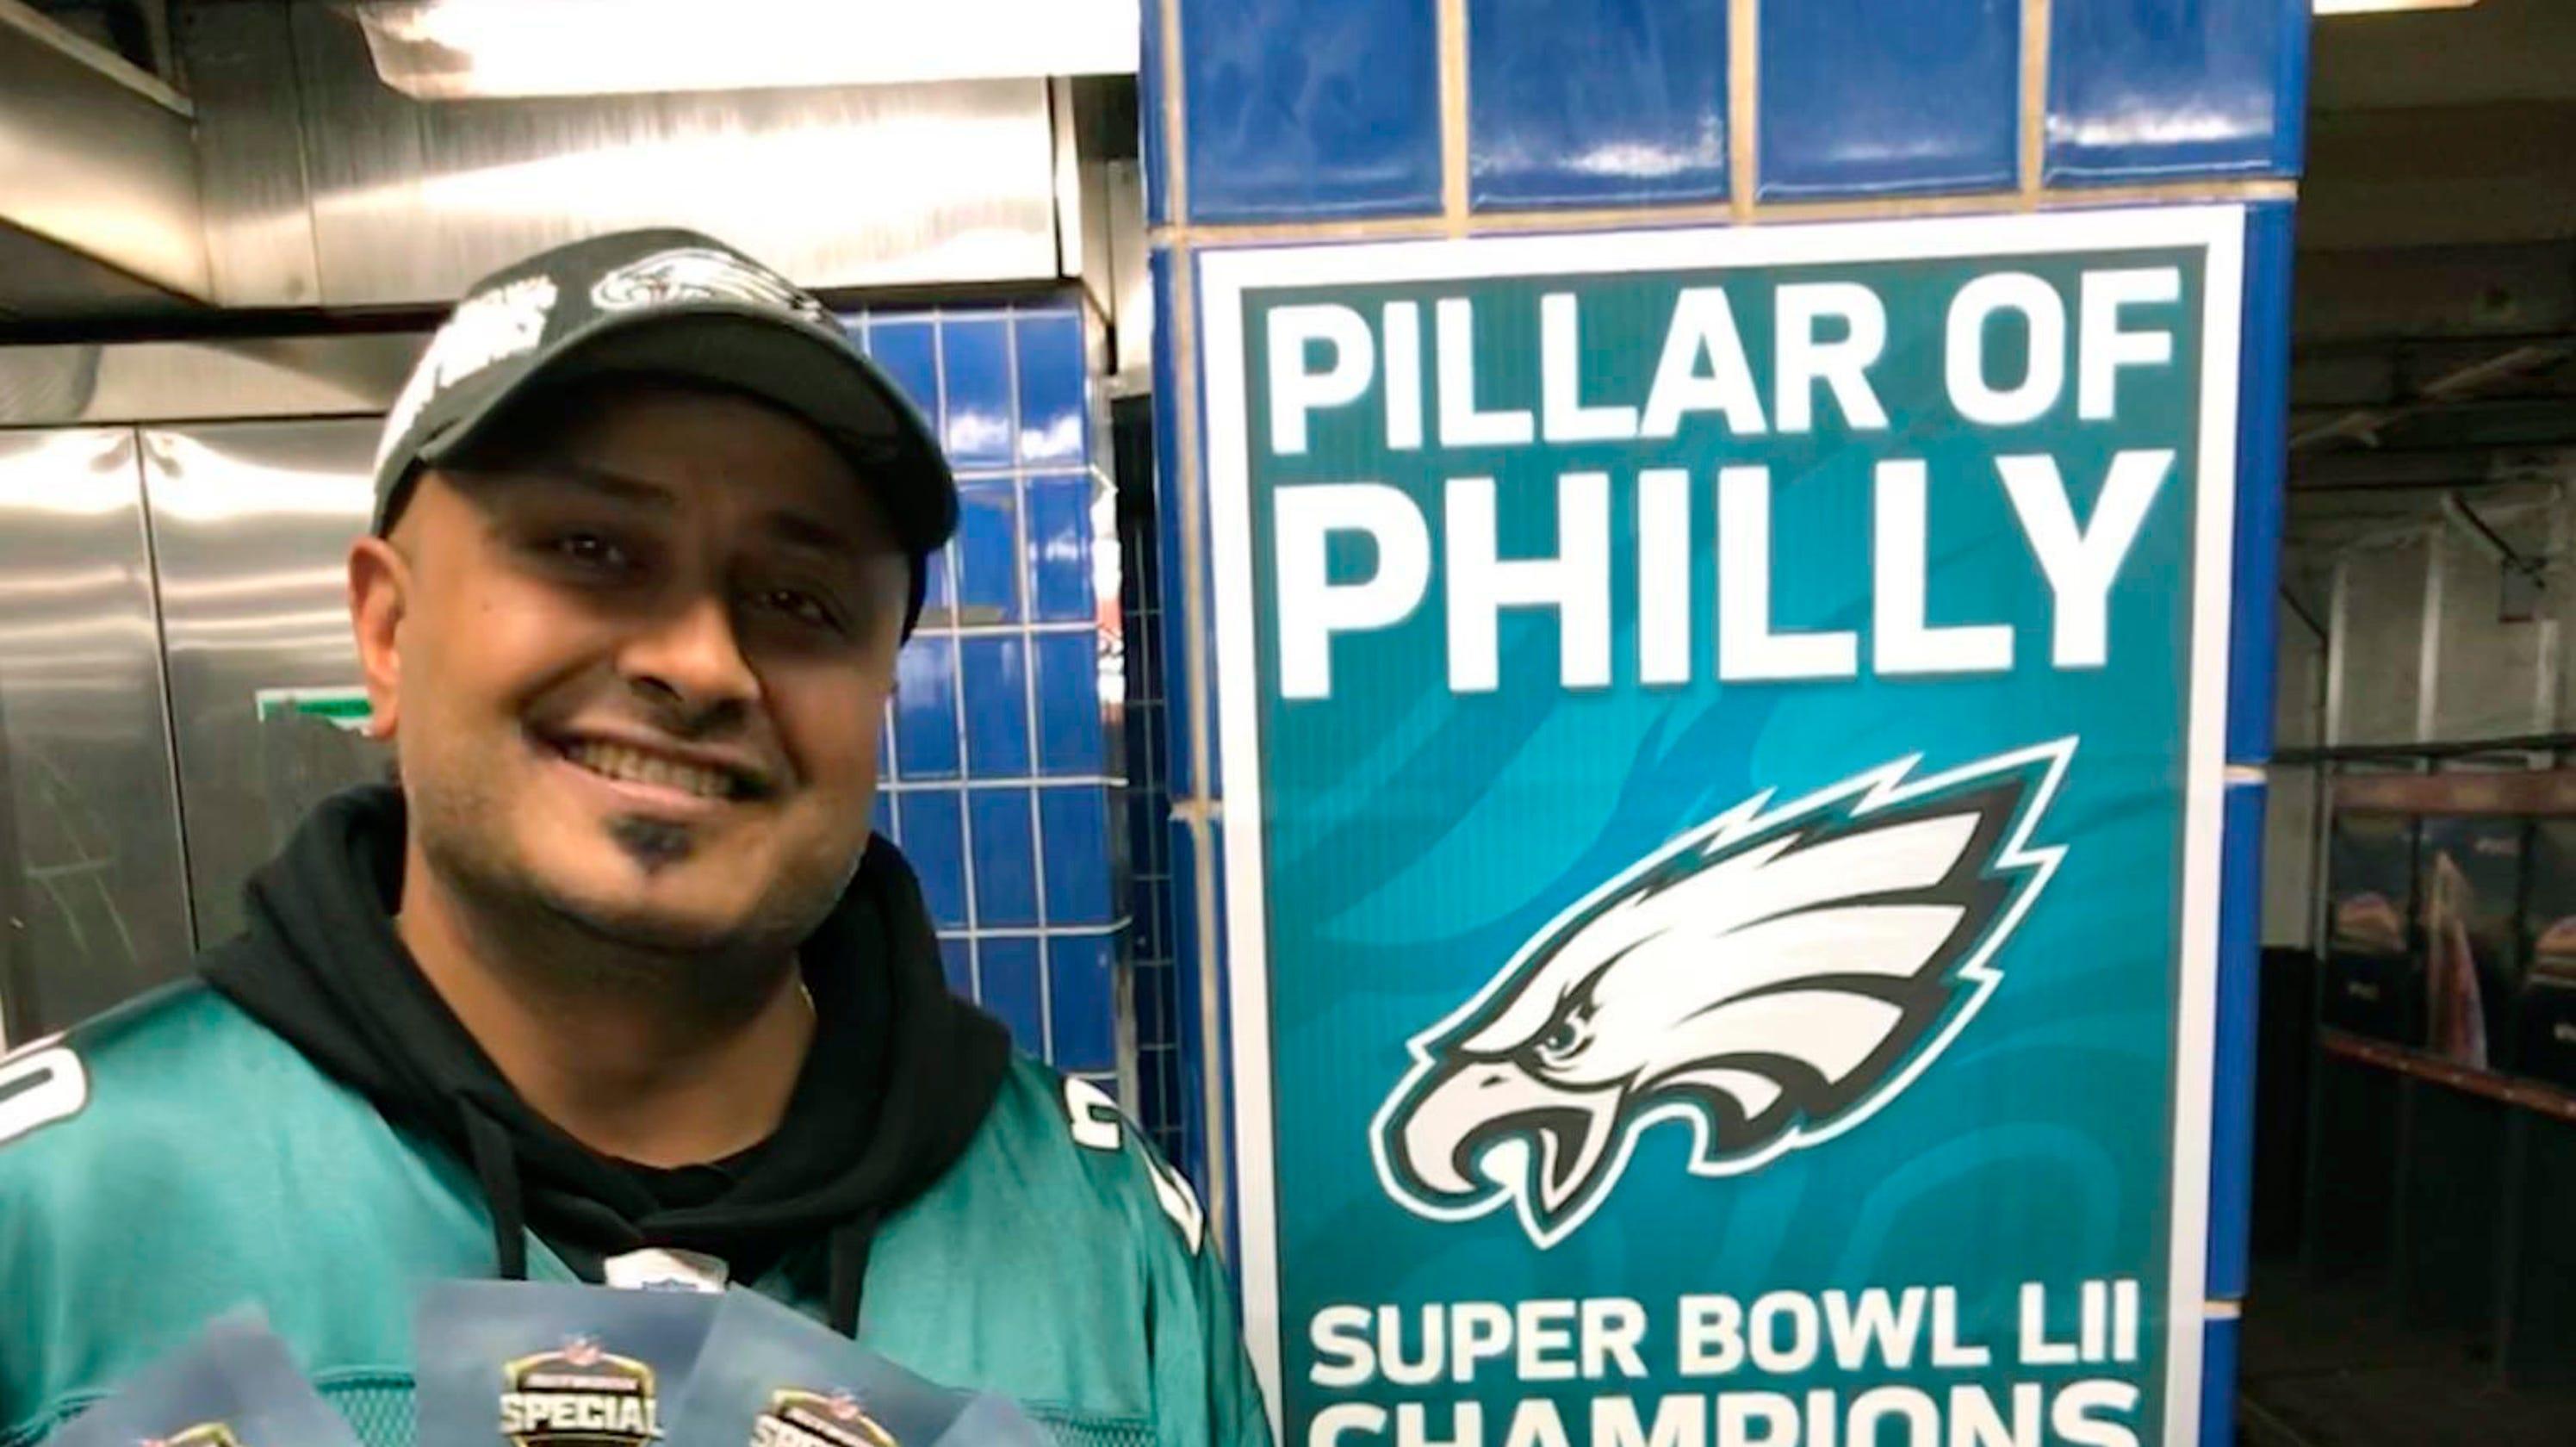 Philadelphia Eagles fan who ran into subway pole finds fame